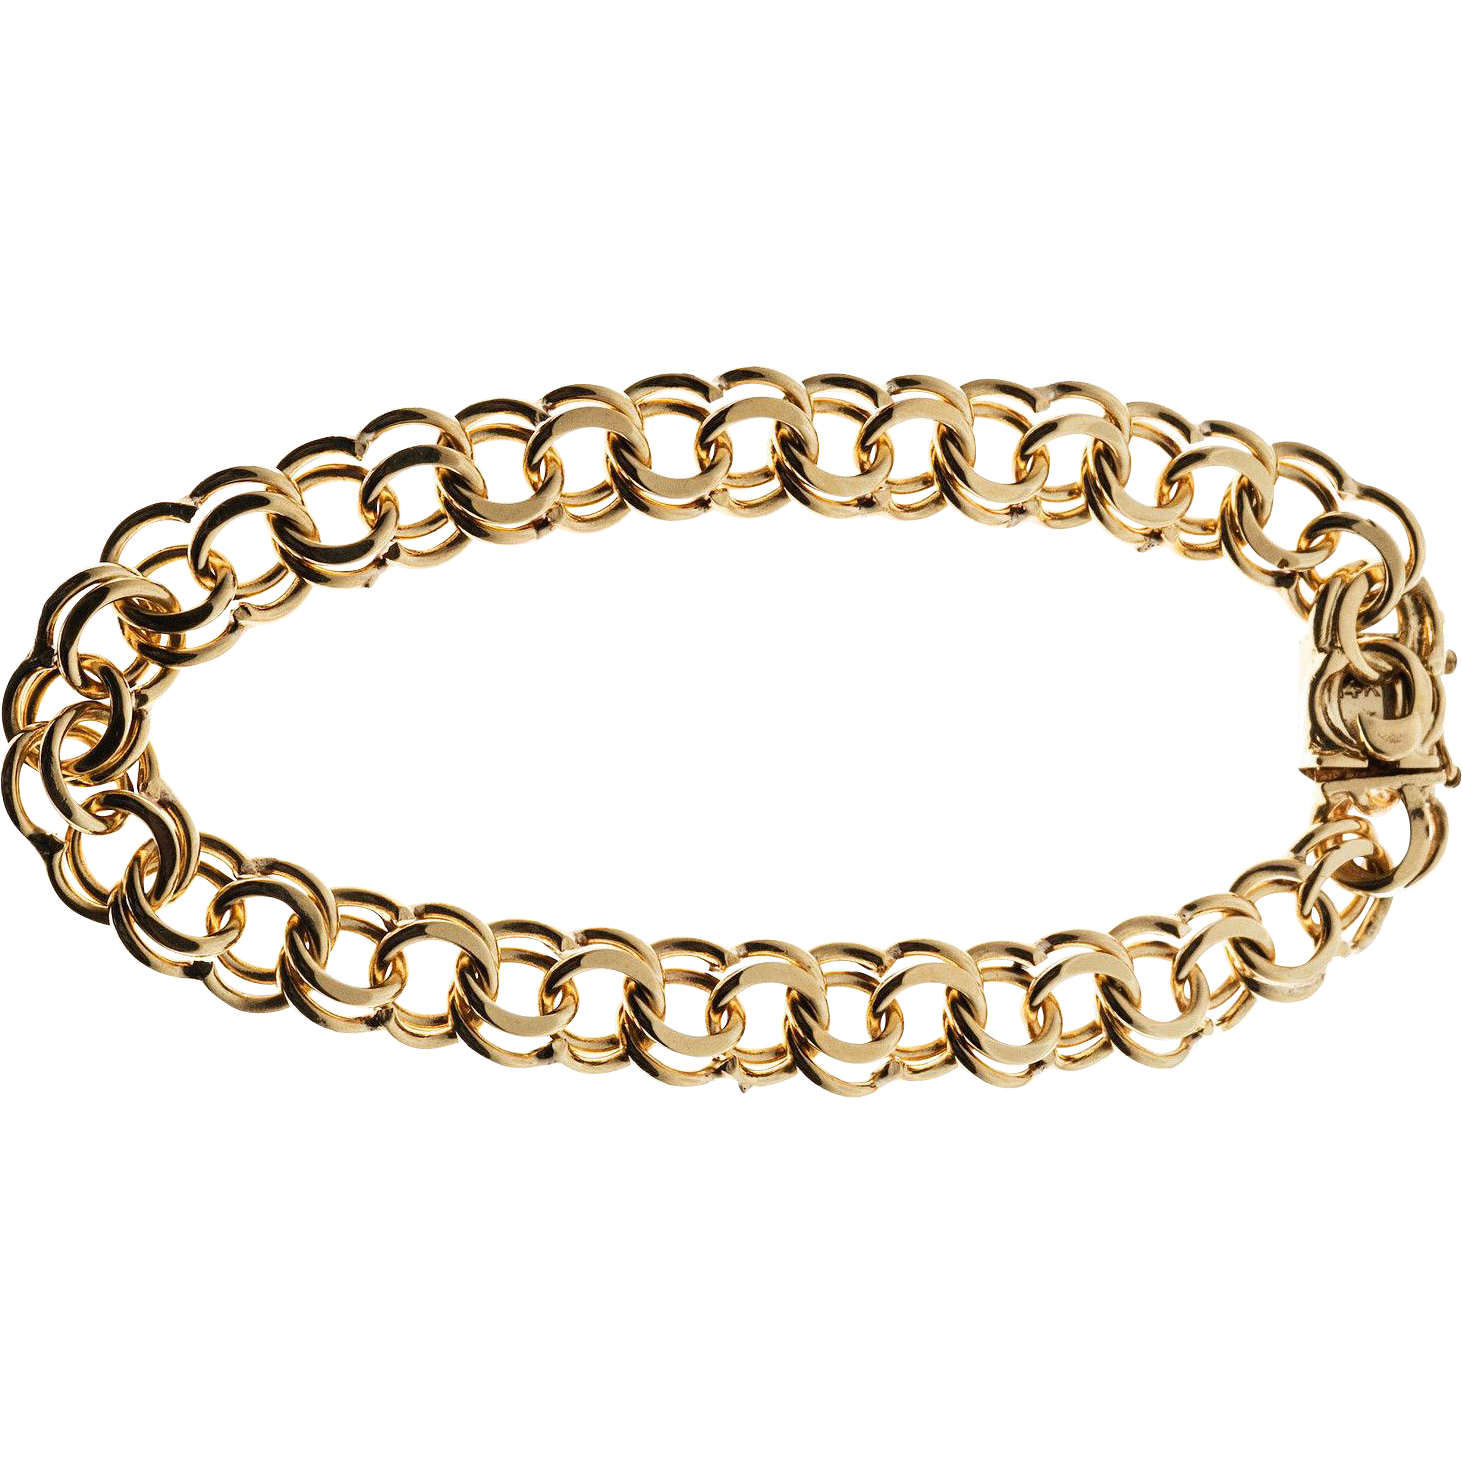 Vintage 14 Karat Yellow Gold Double Spiral Heavy Link Charm Bracelet